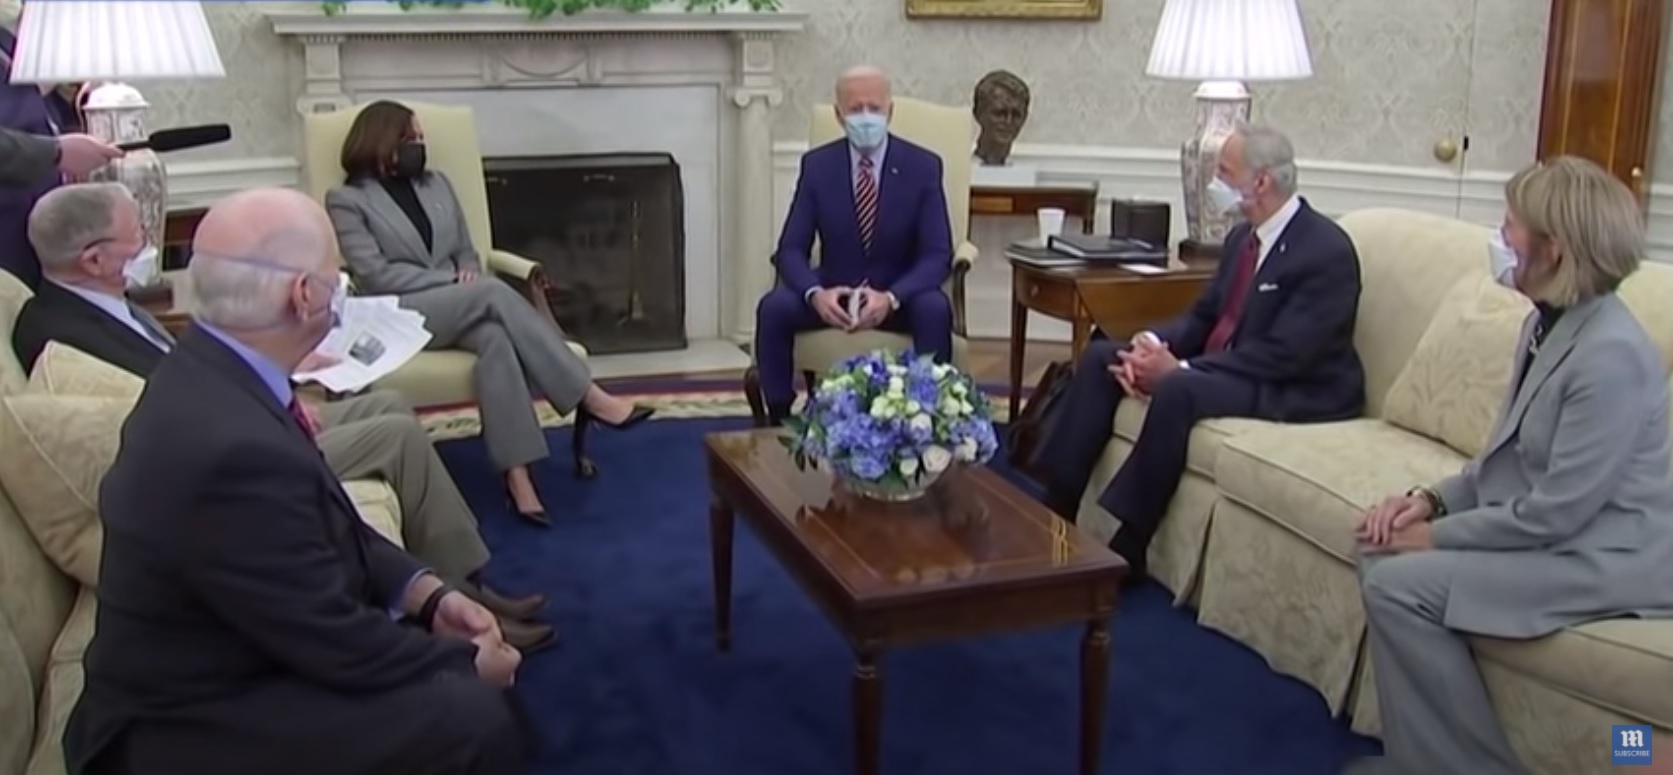 Watch As Biden Does Complete Flip Flop On China Rhetoric